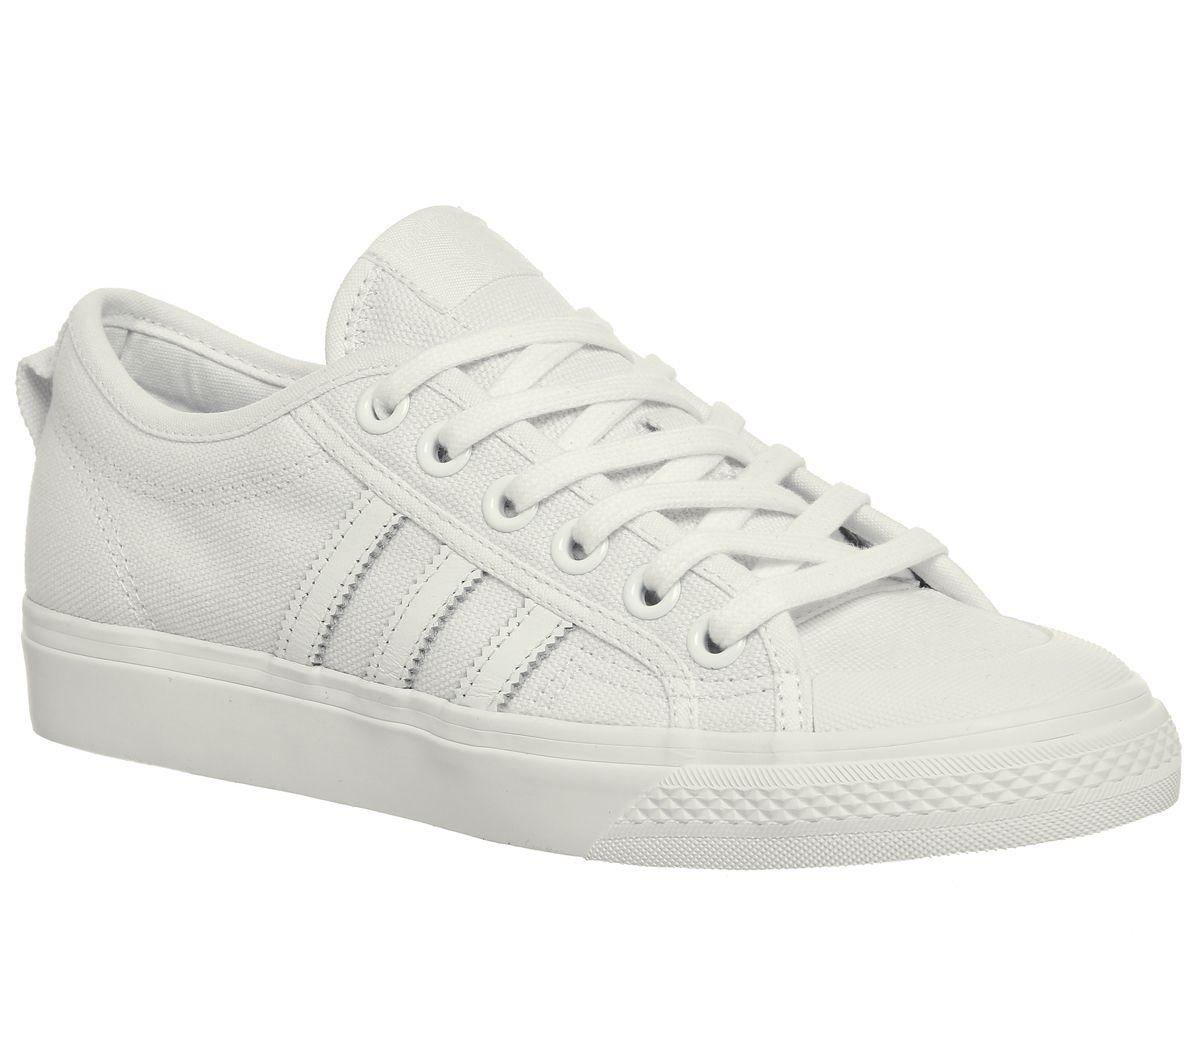 fe70712c2 adidas Nizza Trainers White Mono - Unisex Sports